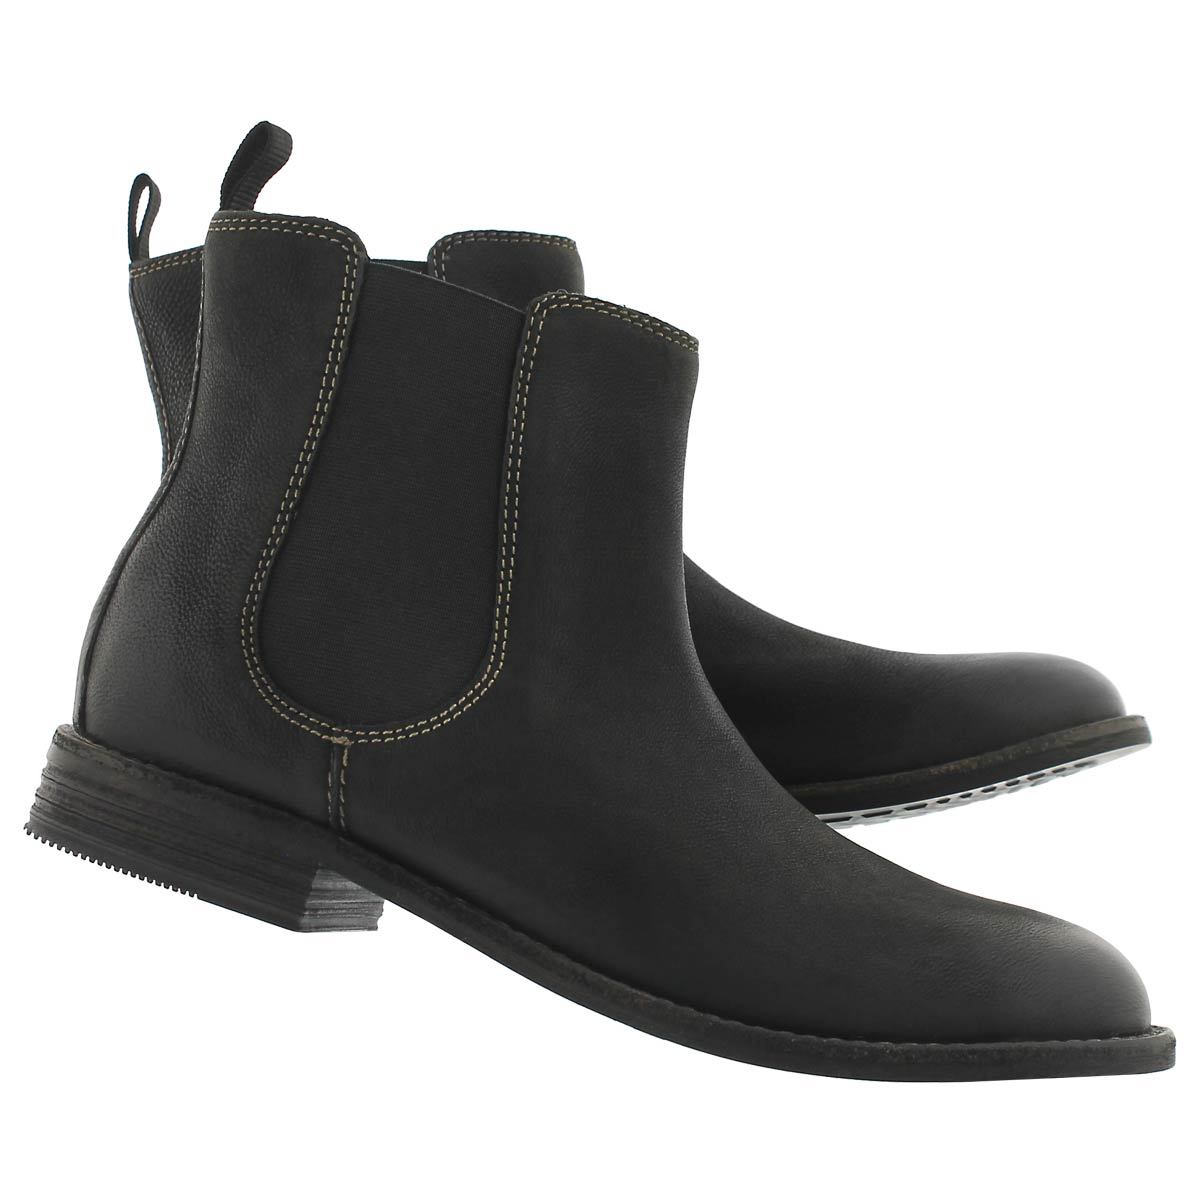 Lds Maypearl Nala black chelsea boot